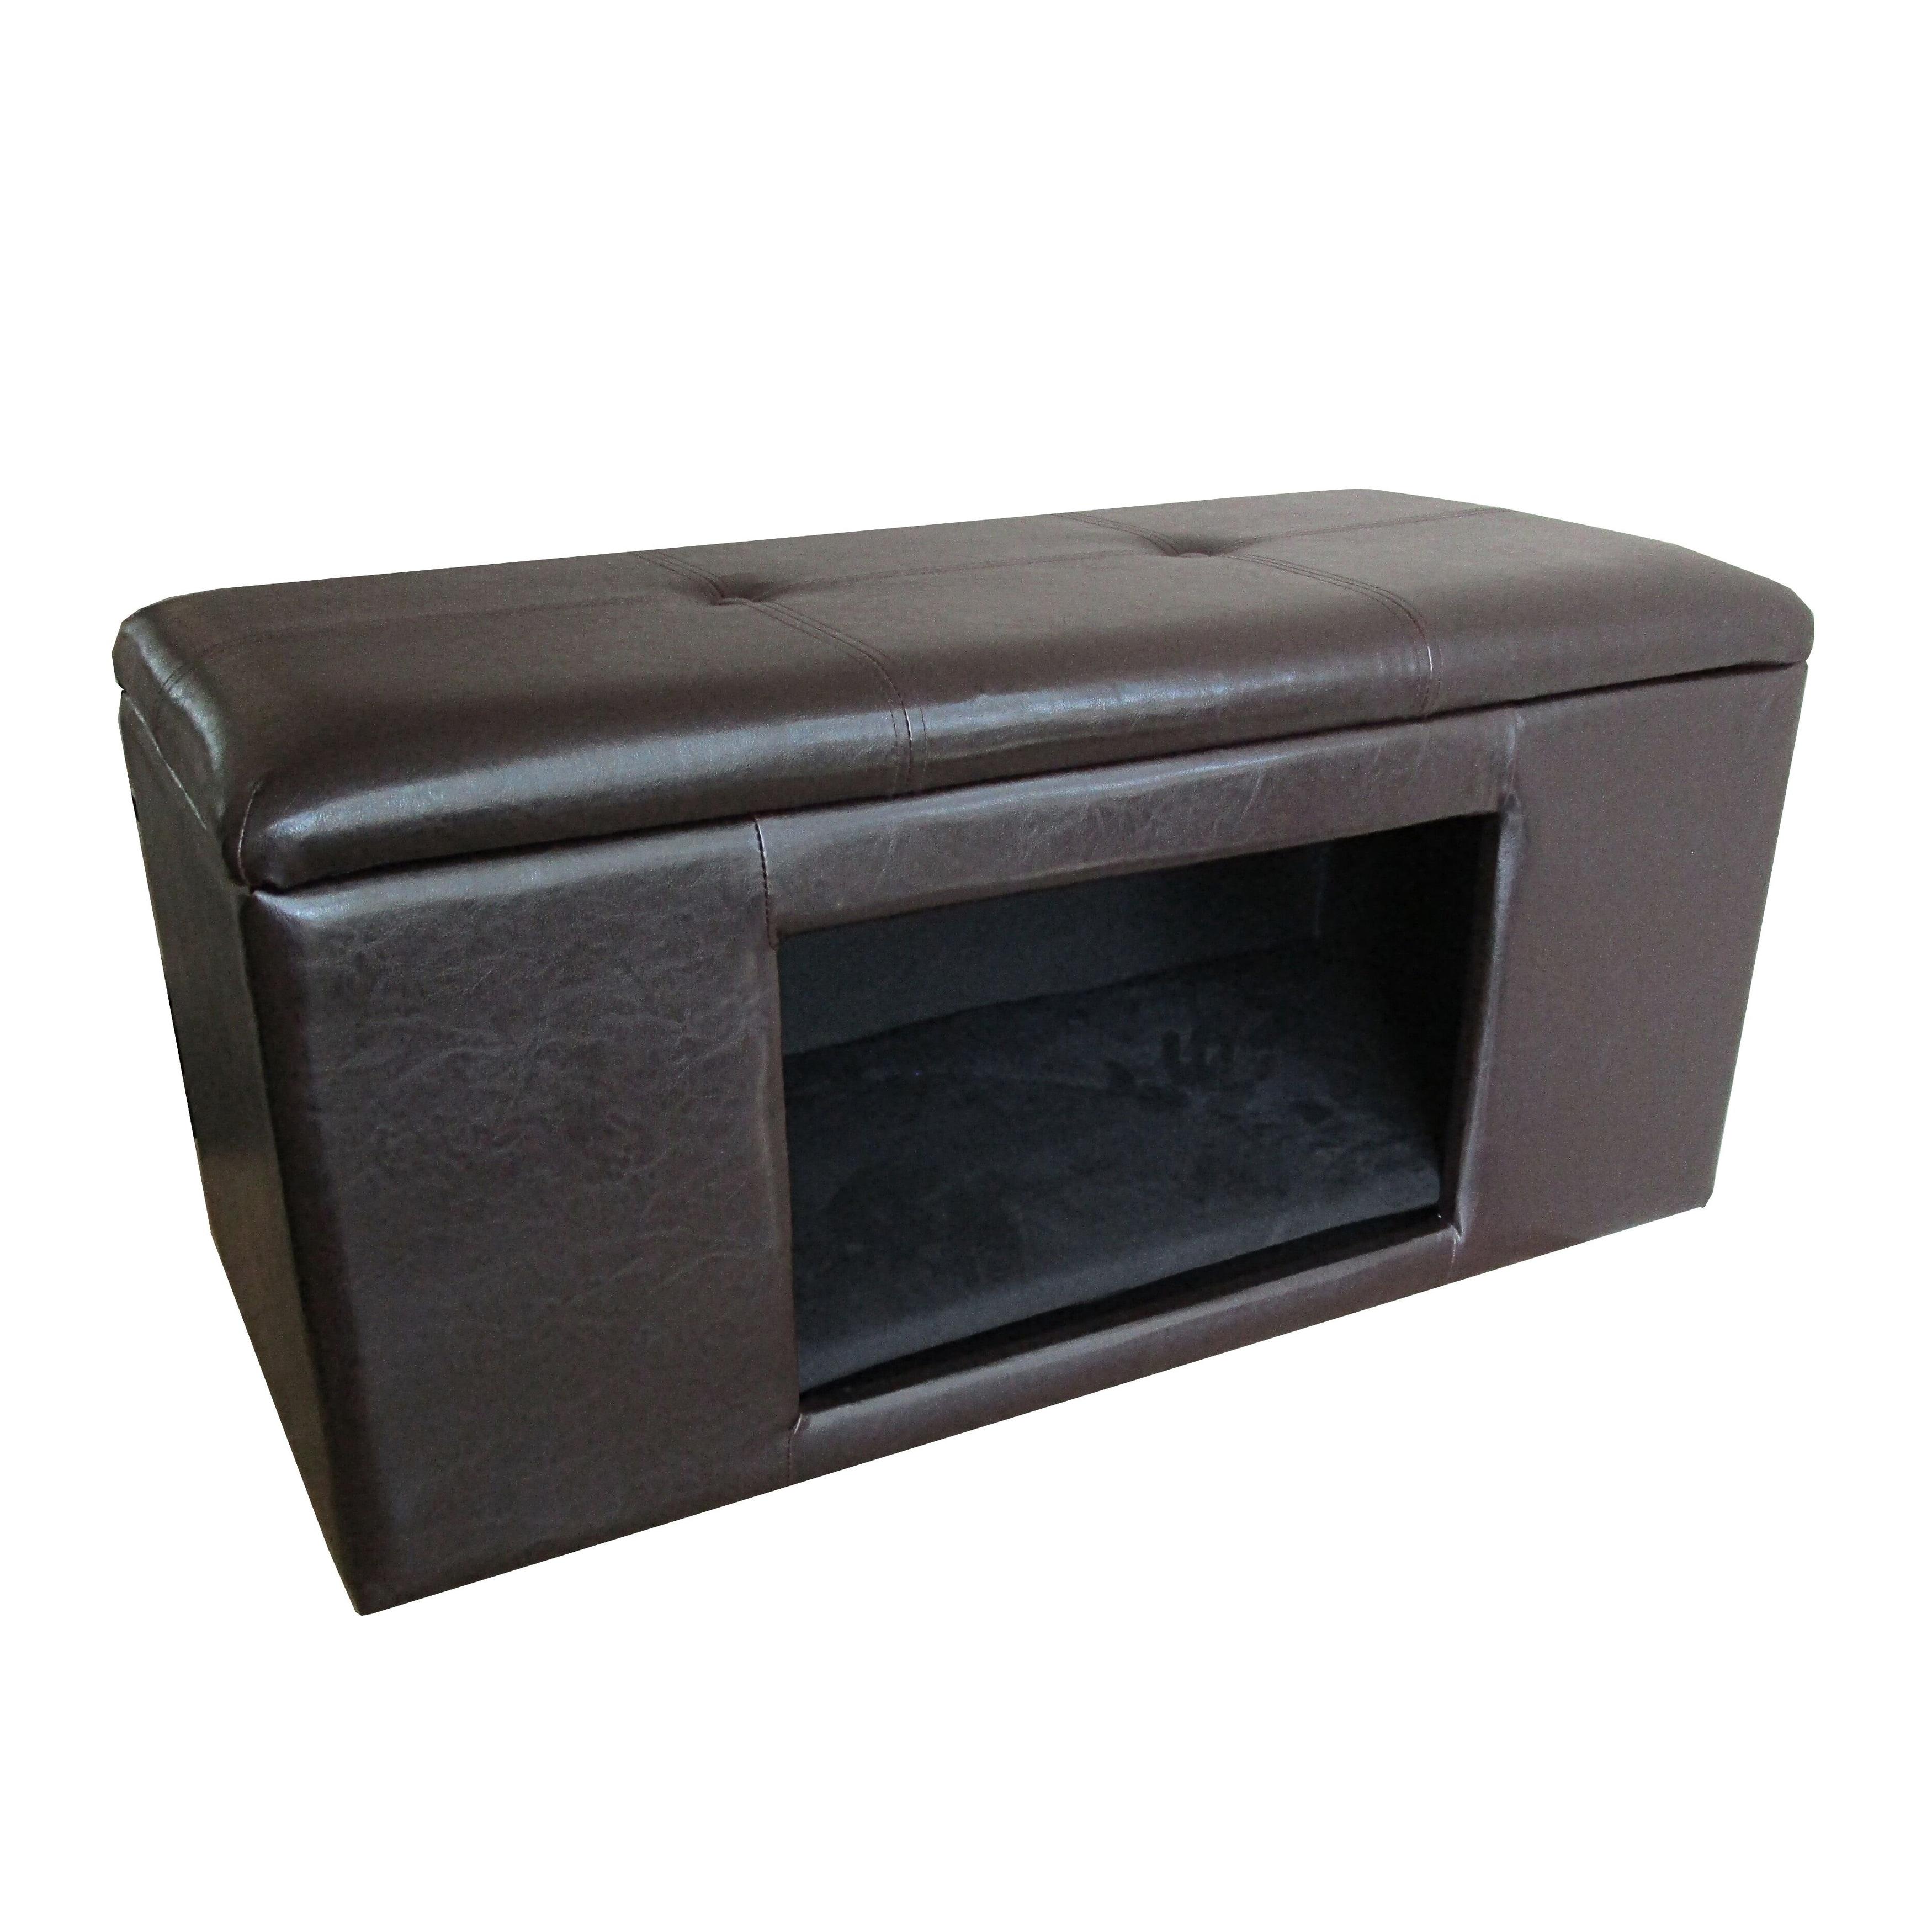 HomePop Comfy Hidden Pet Bed Ottoman Bench (Brown faux le...